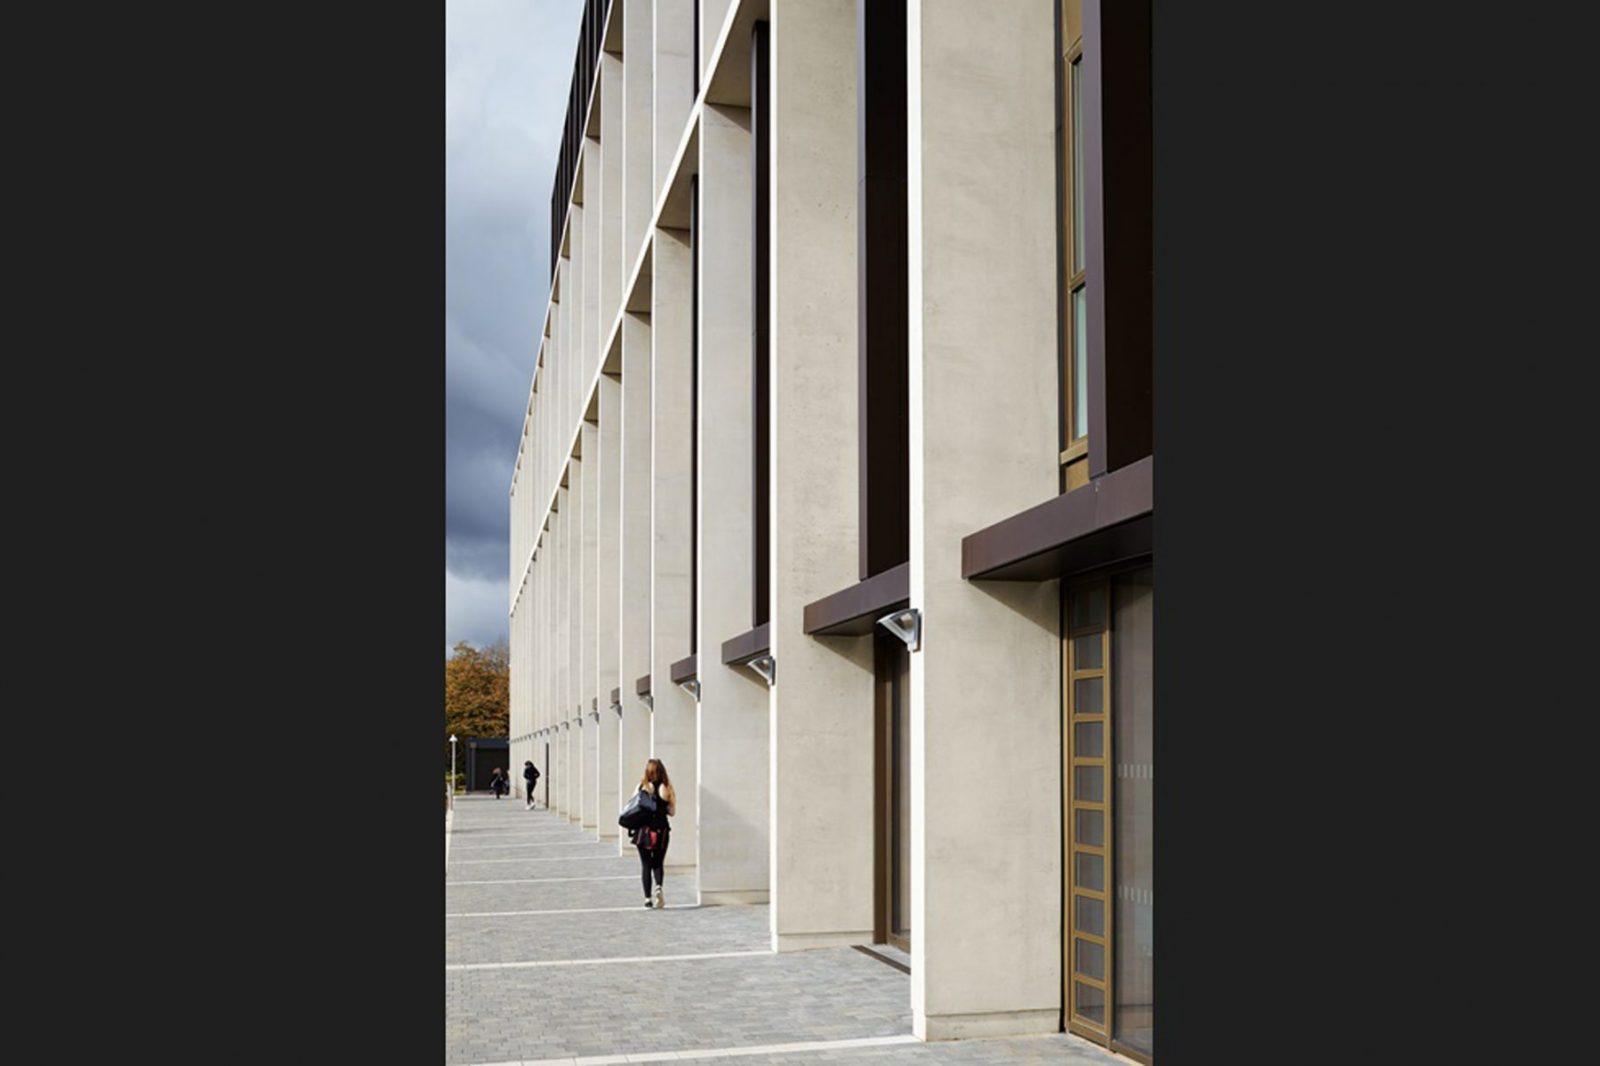 Bath 4ES modern interiors architects jersey architecture05